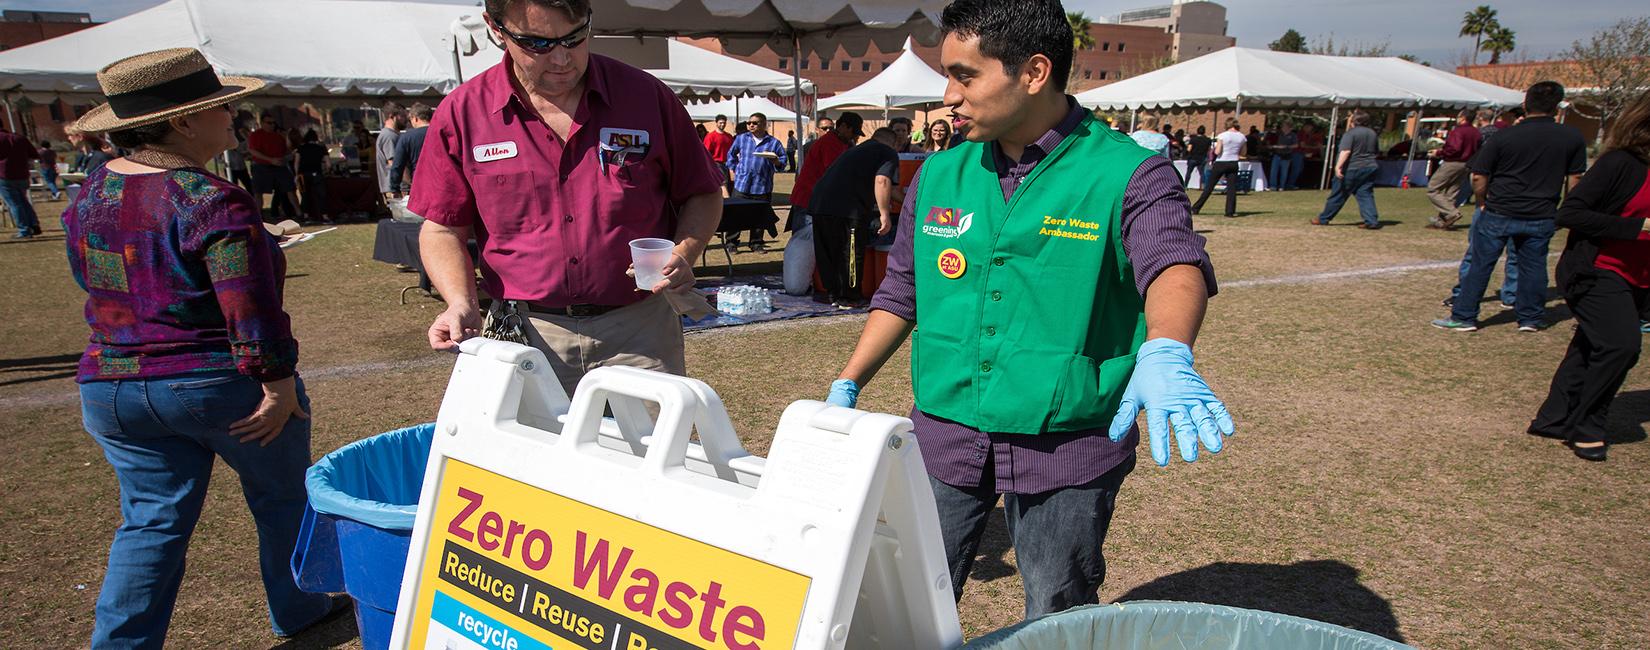 Arizona State University Zero Waste Home Page